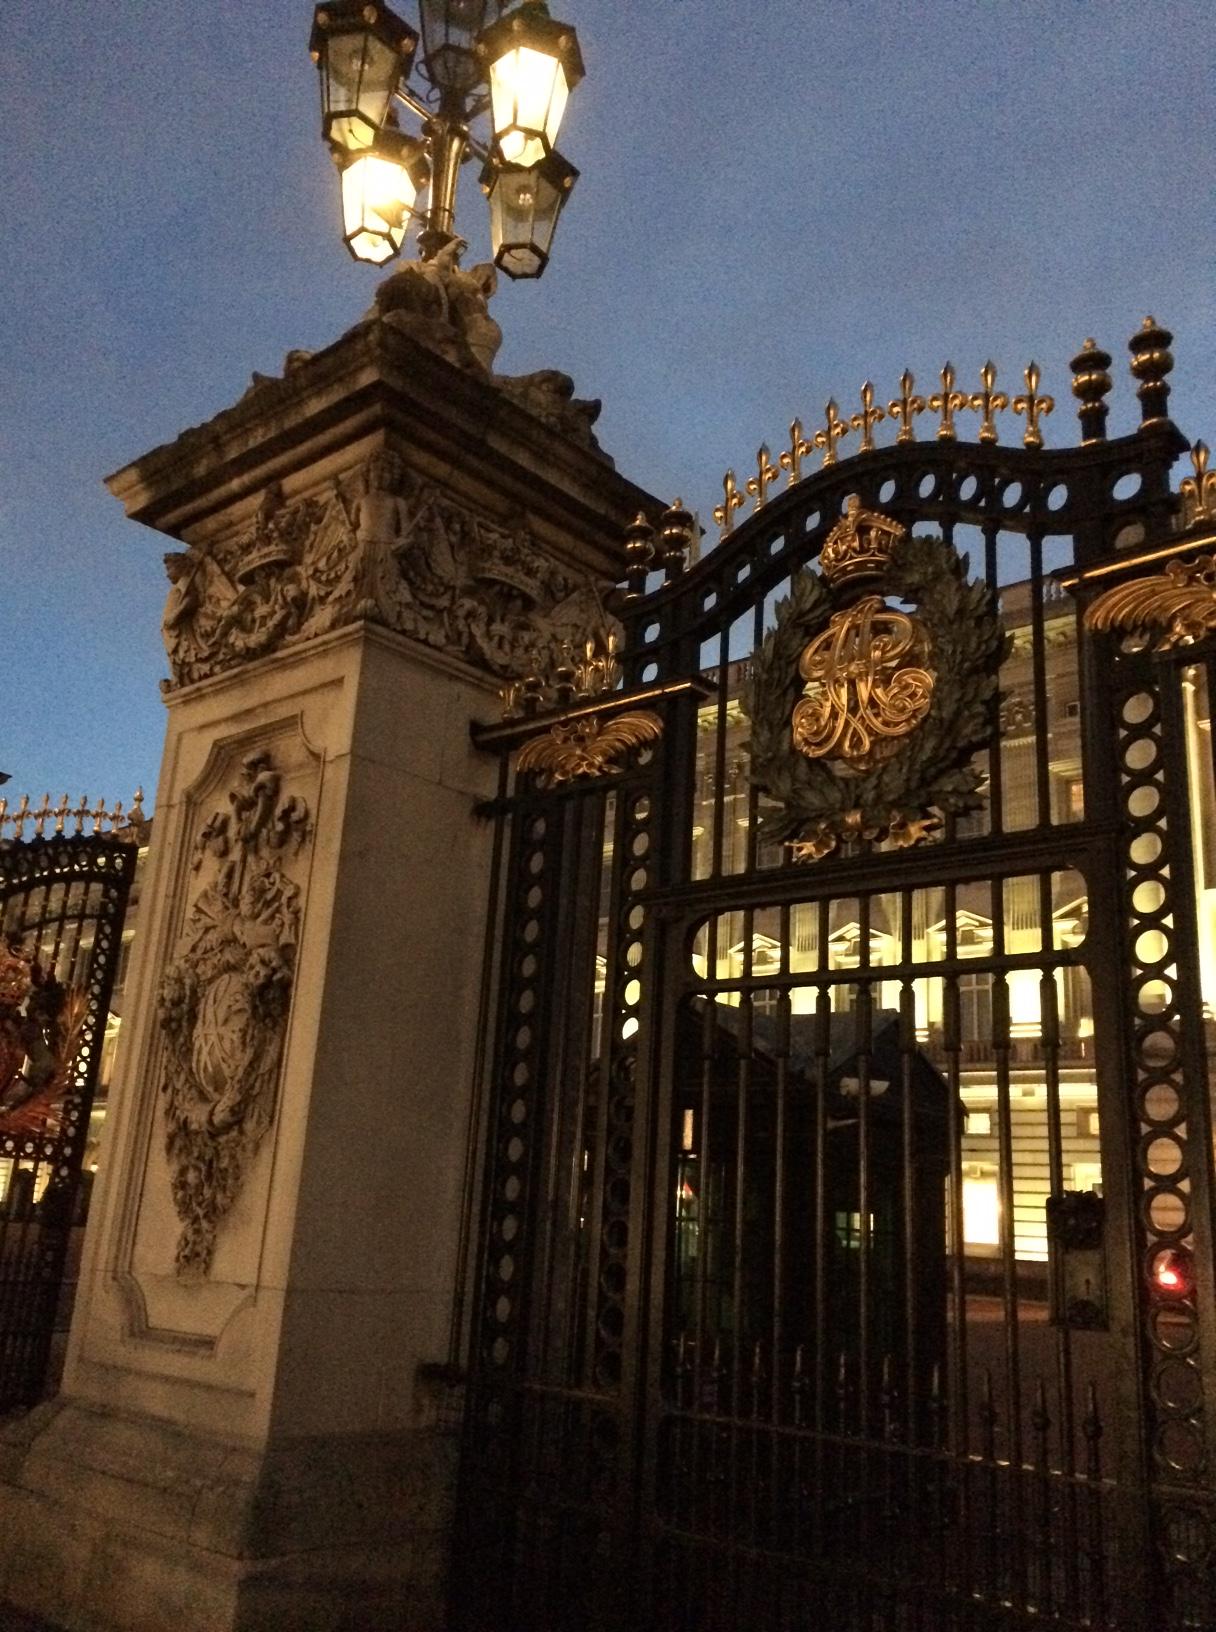 Buckingham closeup night